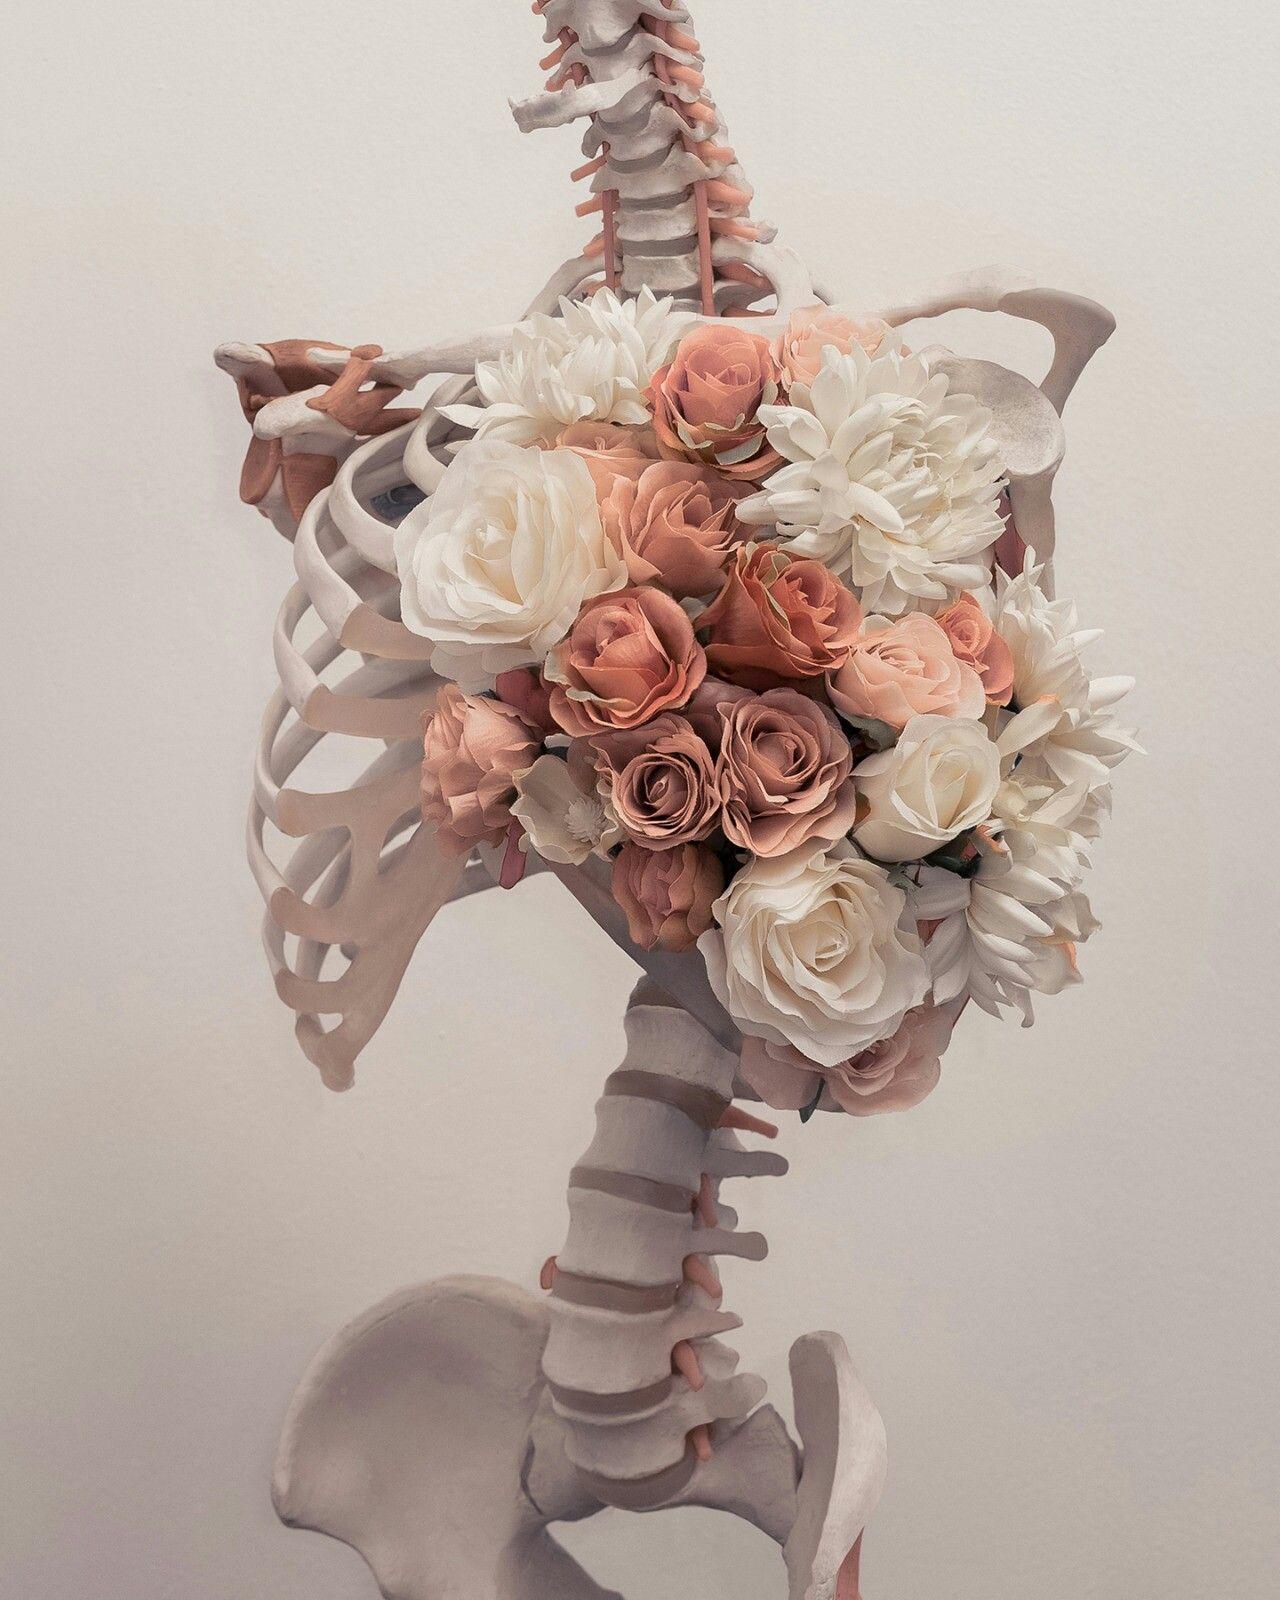 Pin by Chelsea Monico on Mishmash | Pinterest | Anatomy art, Anatomy ...